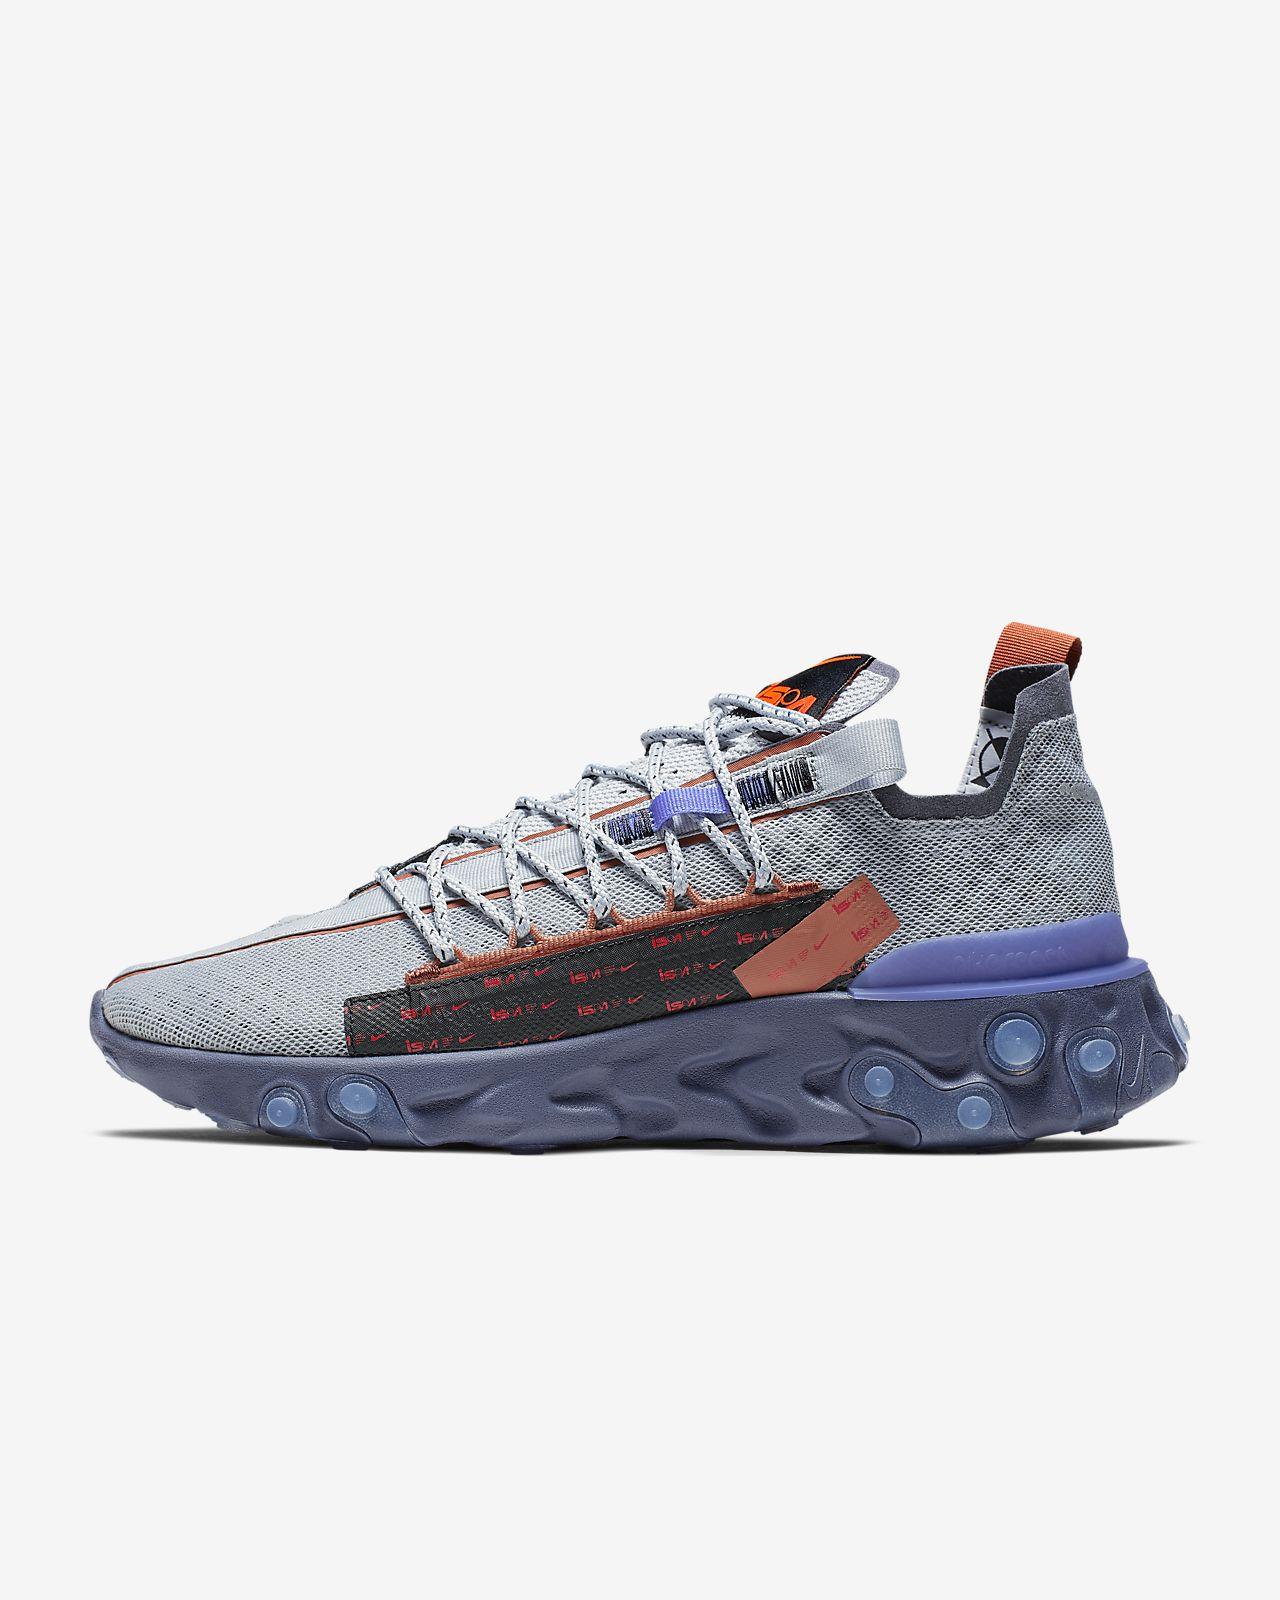 Nike ISPA React Herenschoen